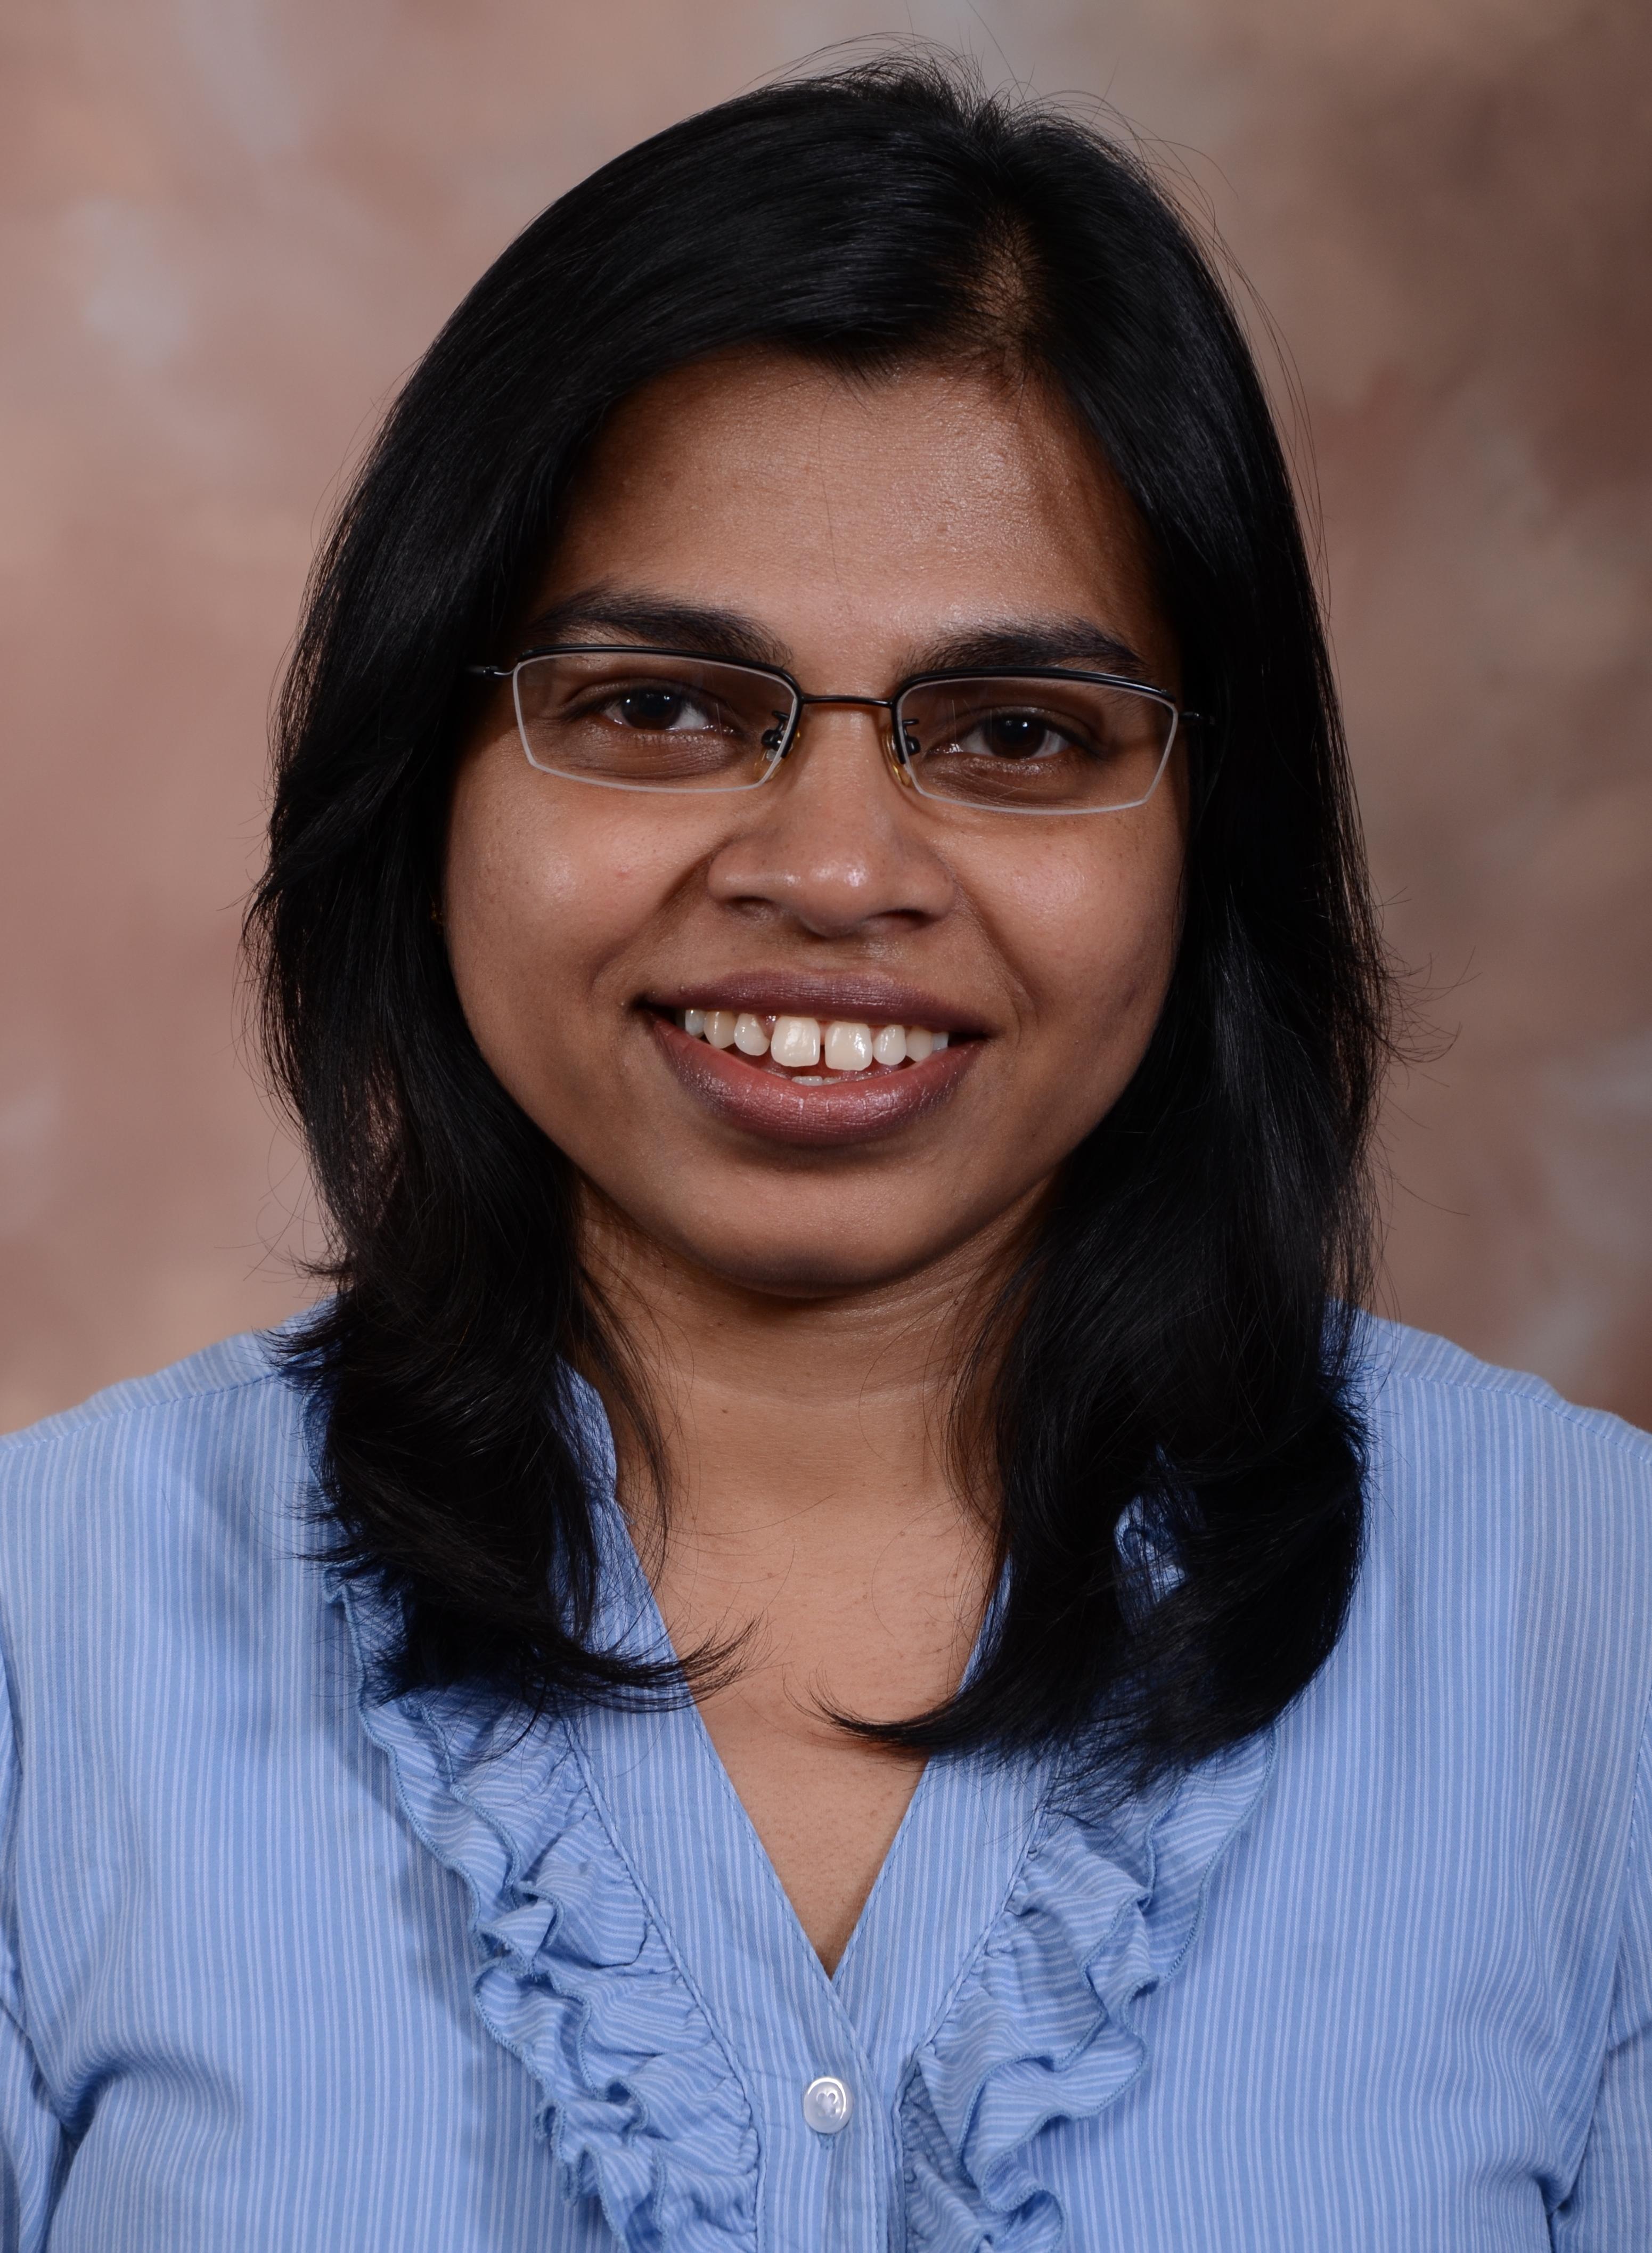 portrait of Nadeeshani Jayasena